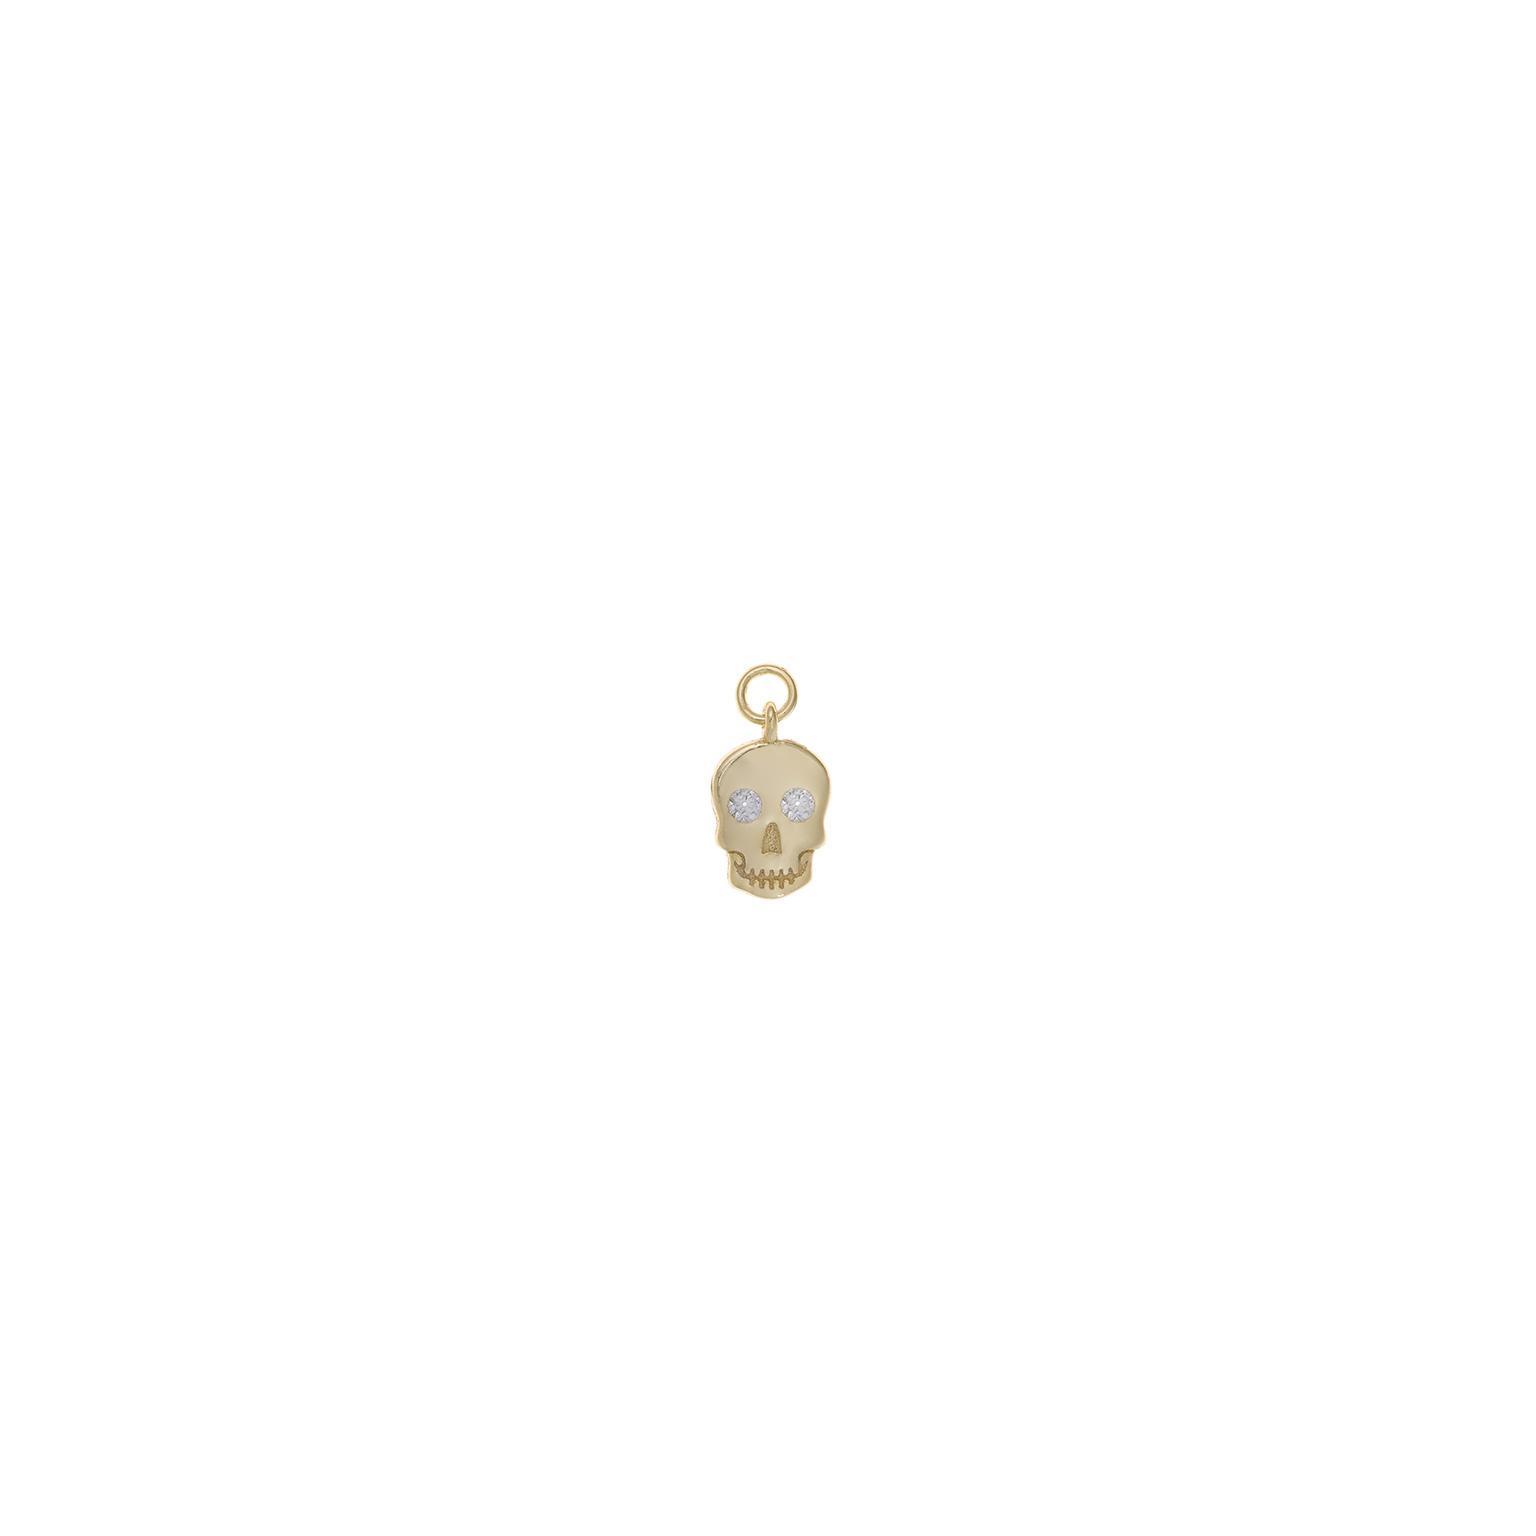 Charm plata Salvatore calavera circonitas blancas dorado